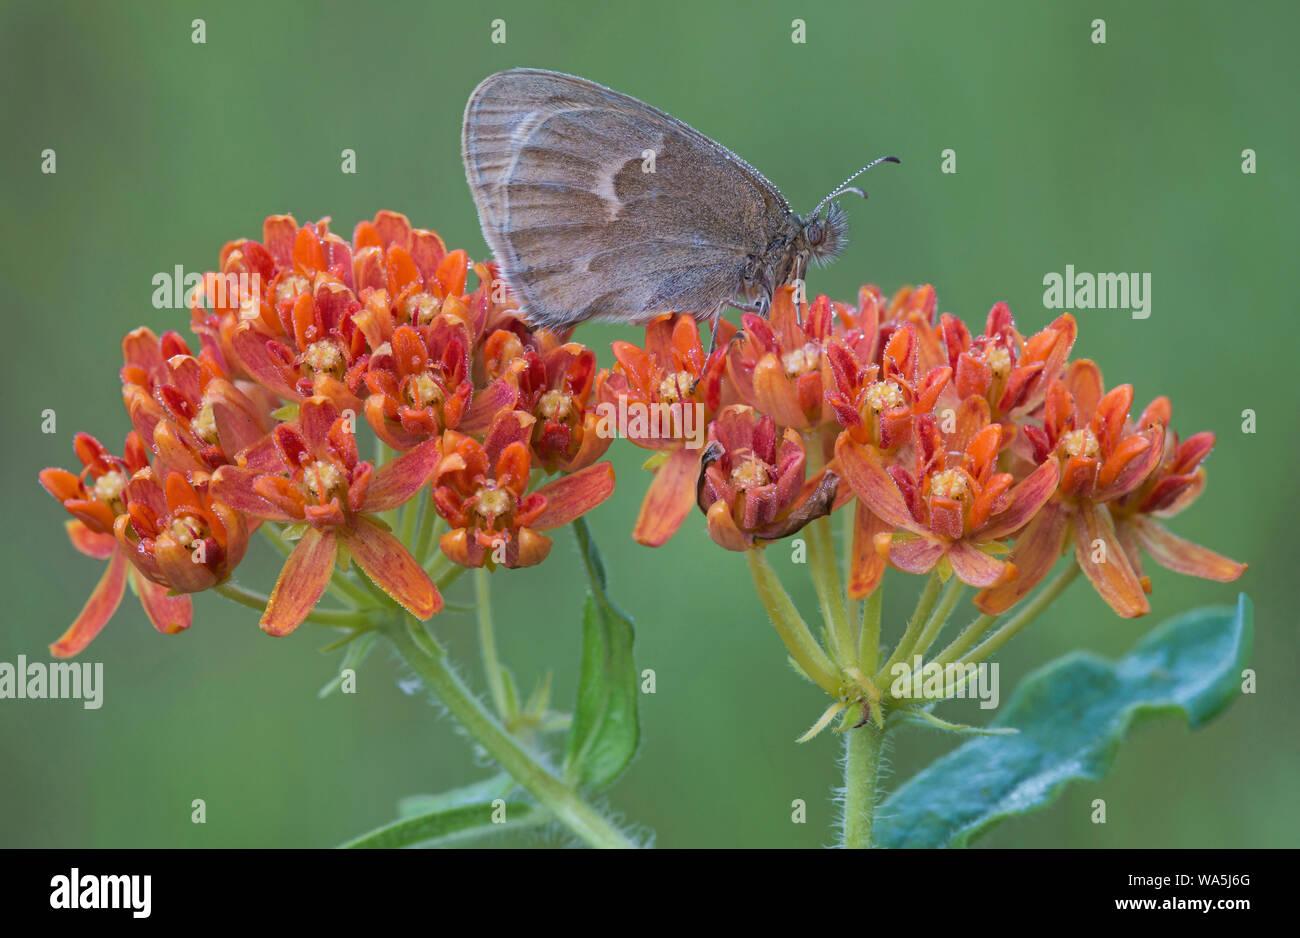 Ringlet butterfly (Coenonympha tullia) alimentándose de mariposas (Asclepias Asclepias tuberosus), el Este de los Estados Unidos, por omitir Moody/Dembinsky Foto Assoc Foto de stock